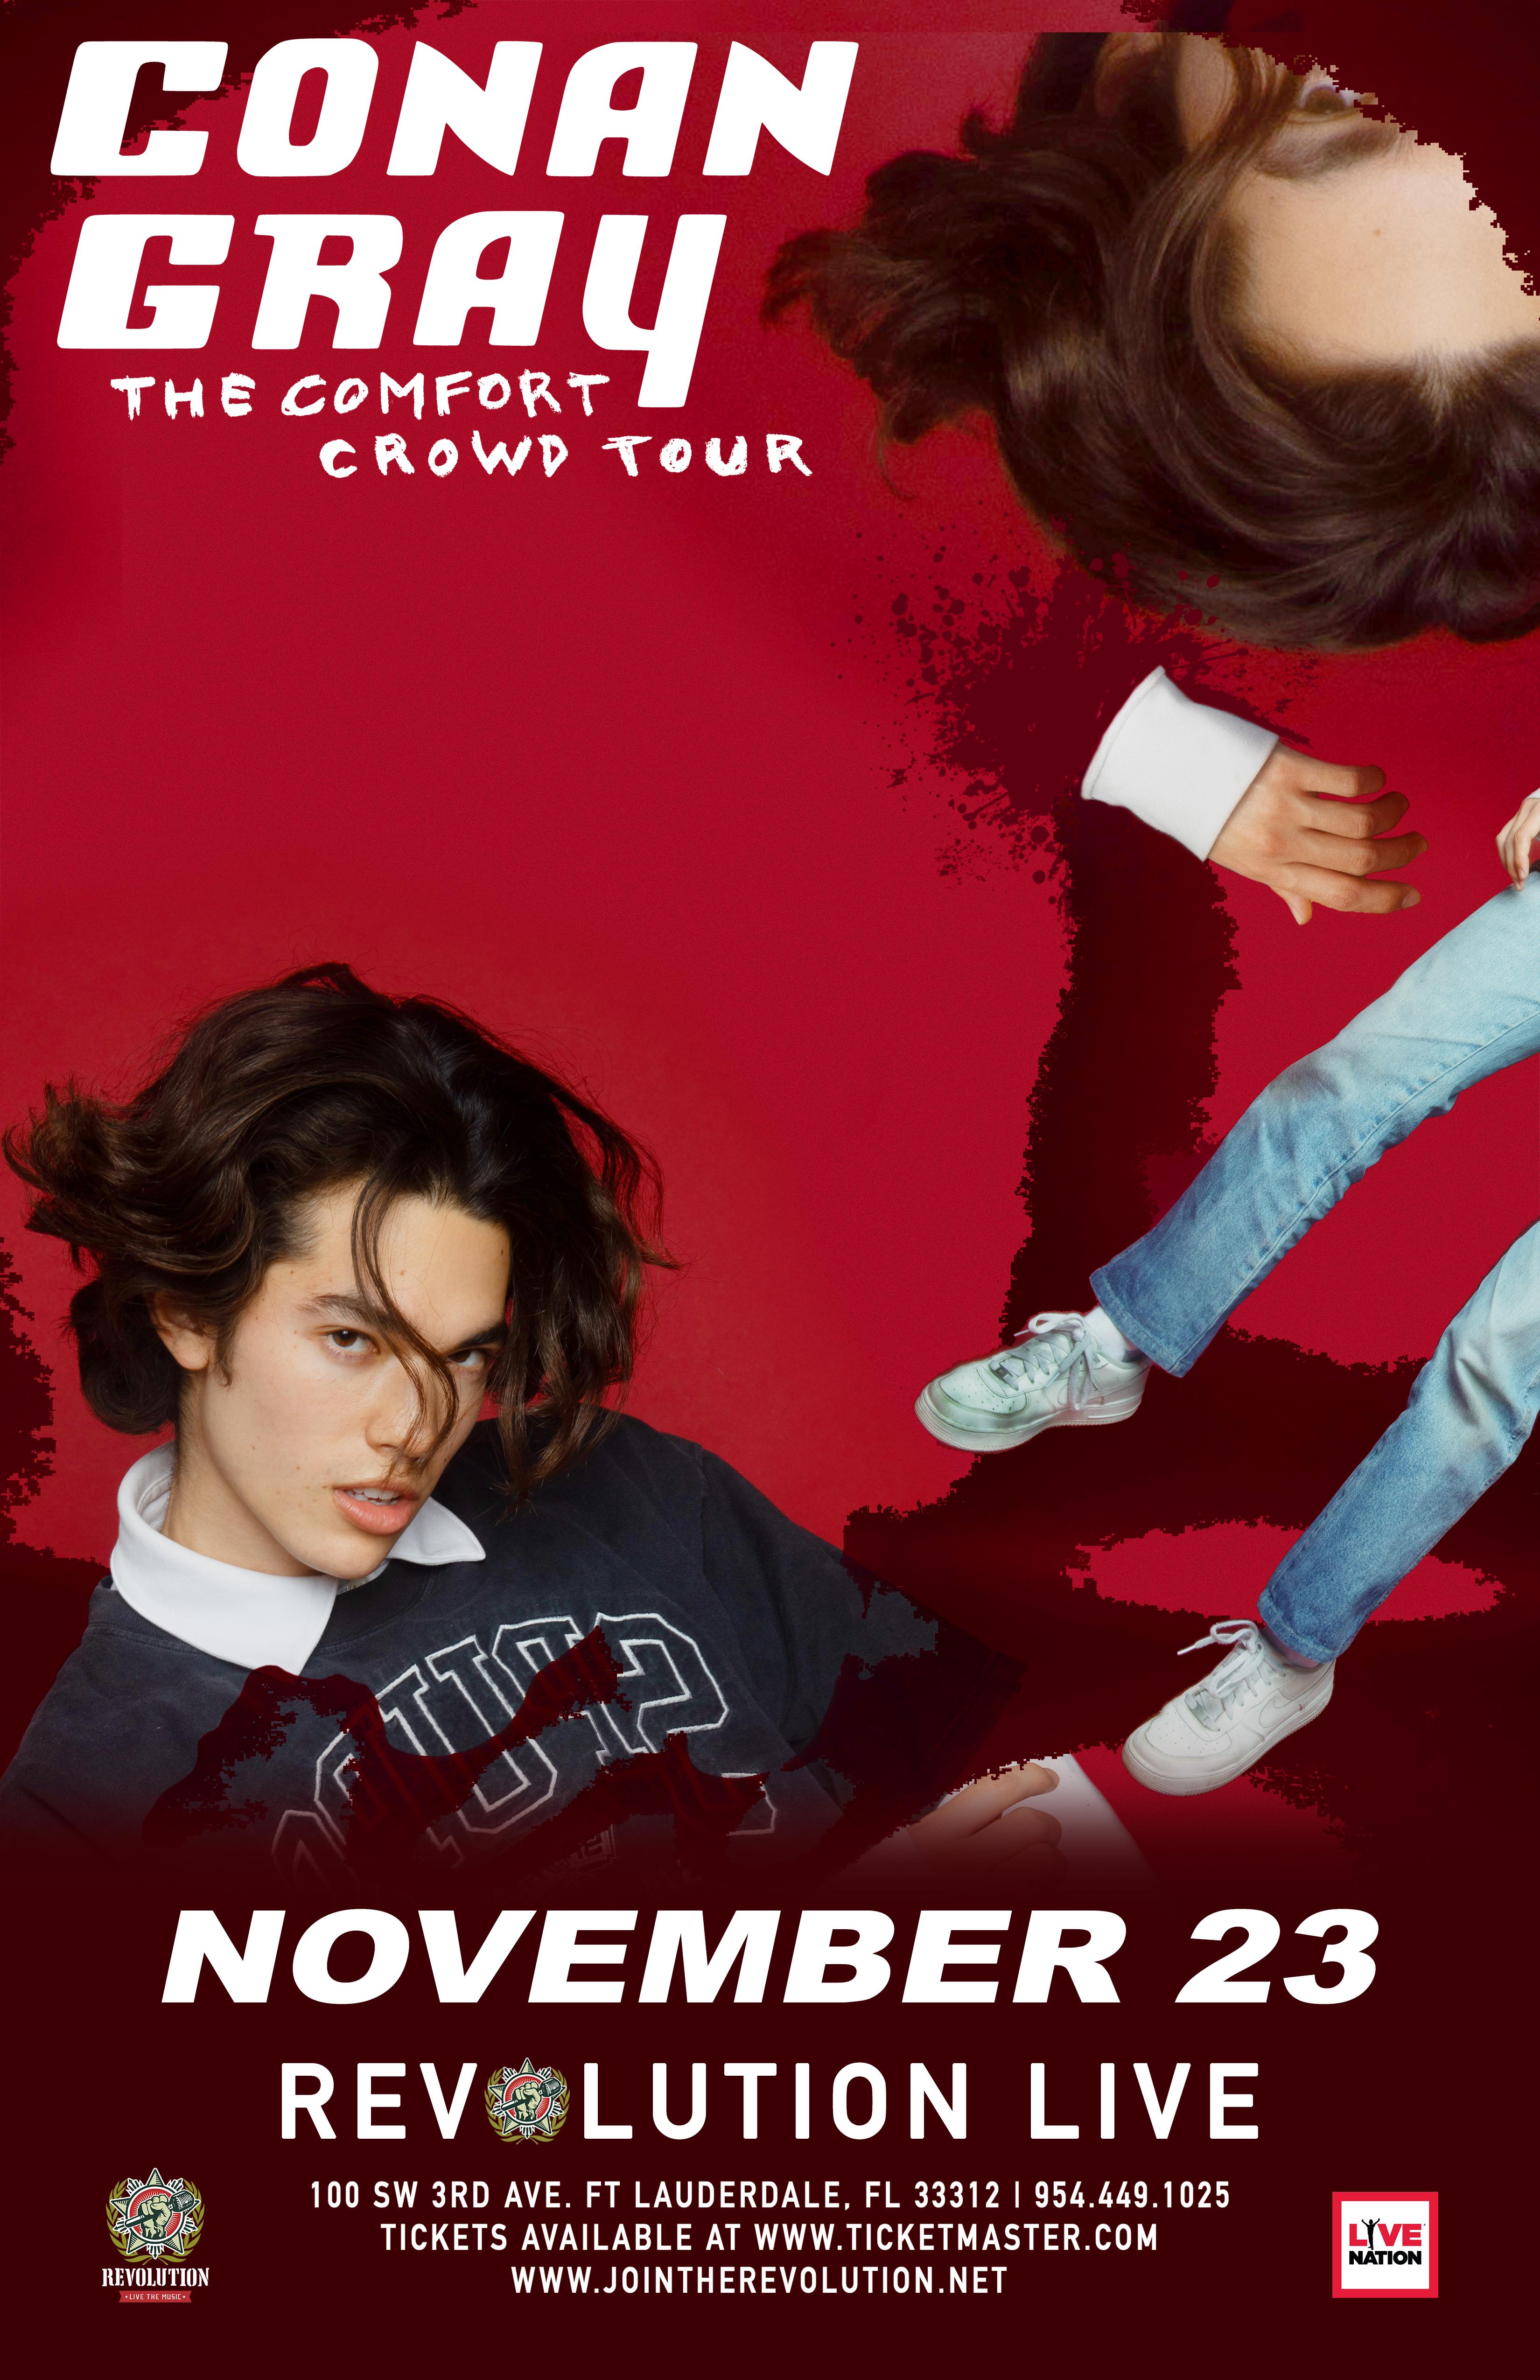 Conan Gray - The Comfort Crowd Tour